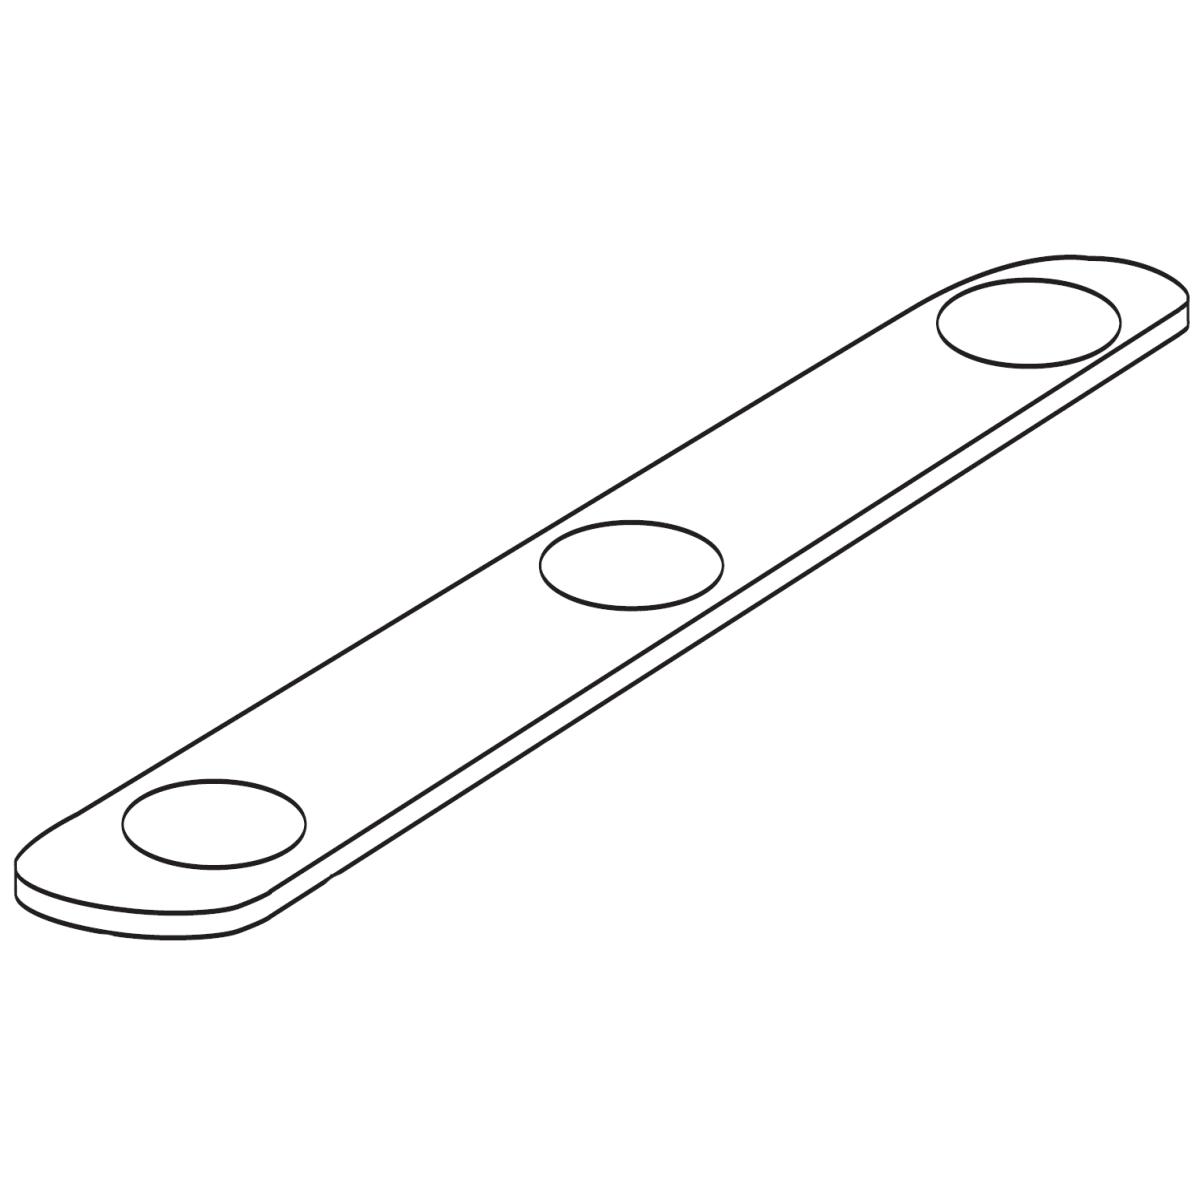 Moen 98213 Manufacturer Replacement Part, Chrome